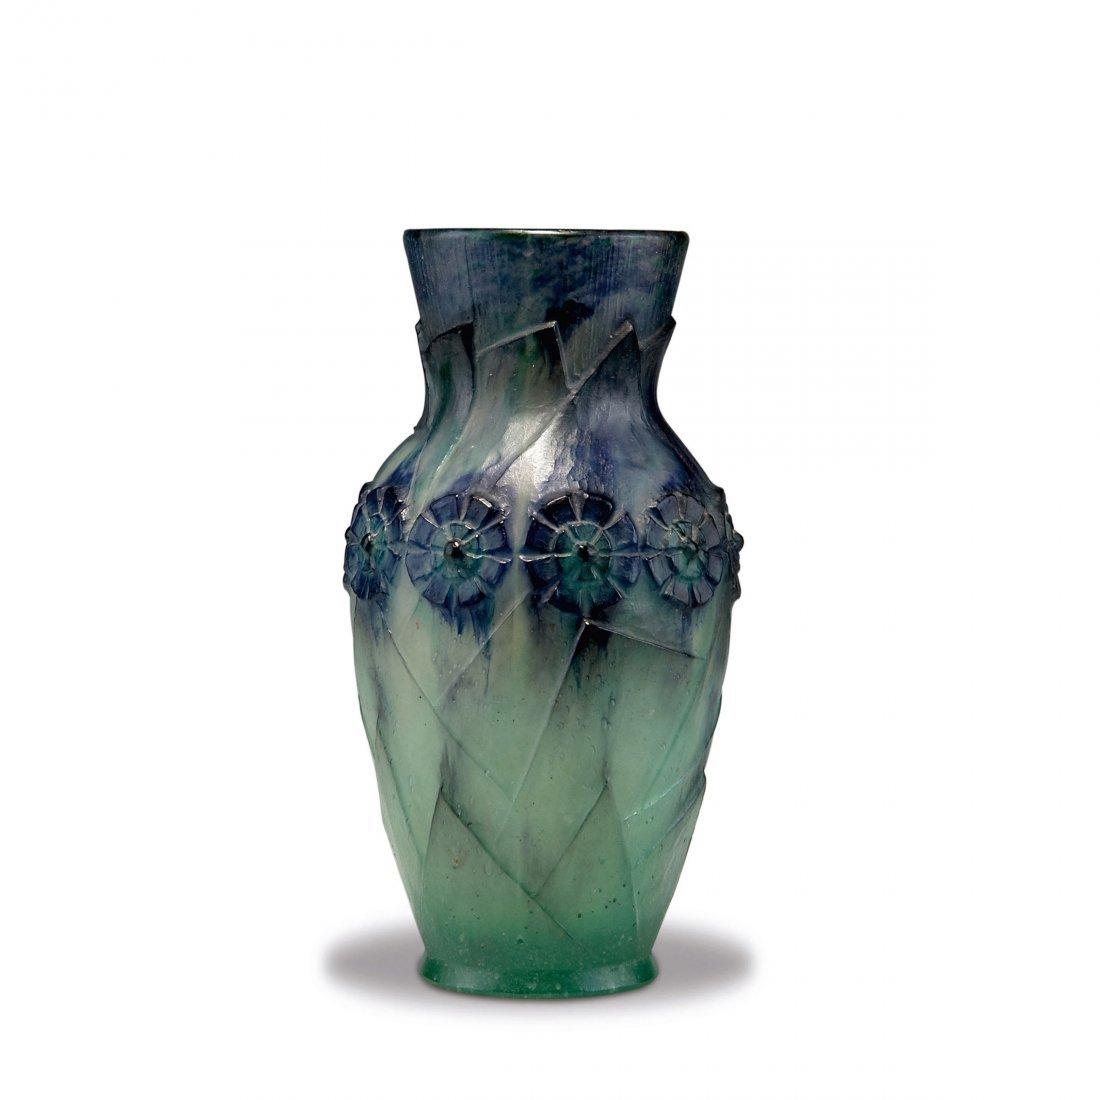 'Feuillages modernes et fleurs' vase, 1925